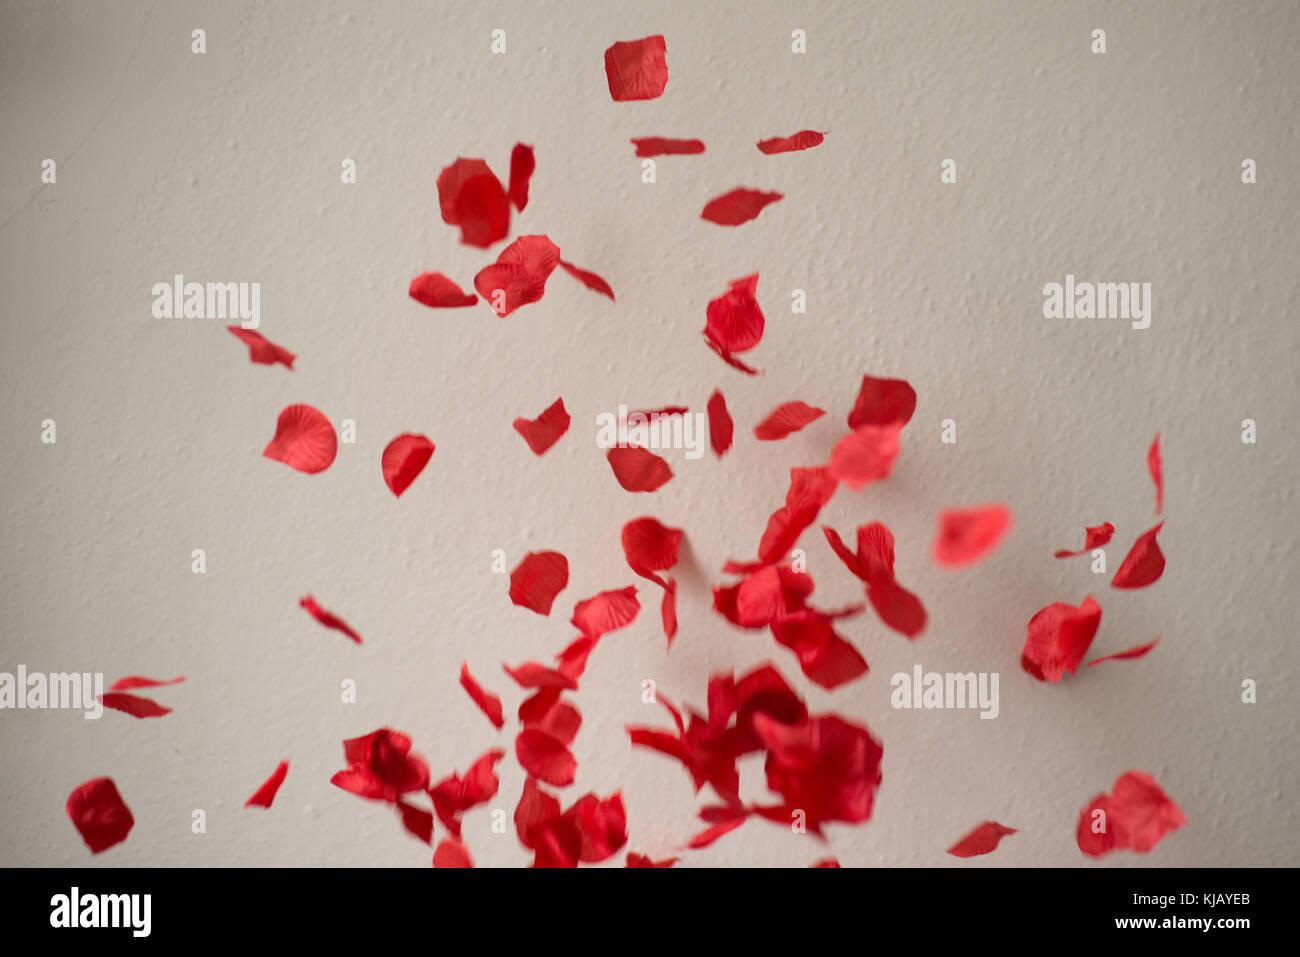 Falling Rose Petals - Stock Image